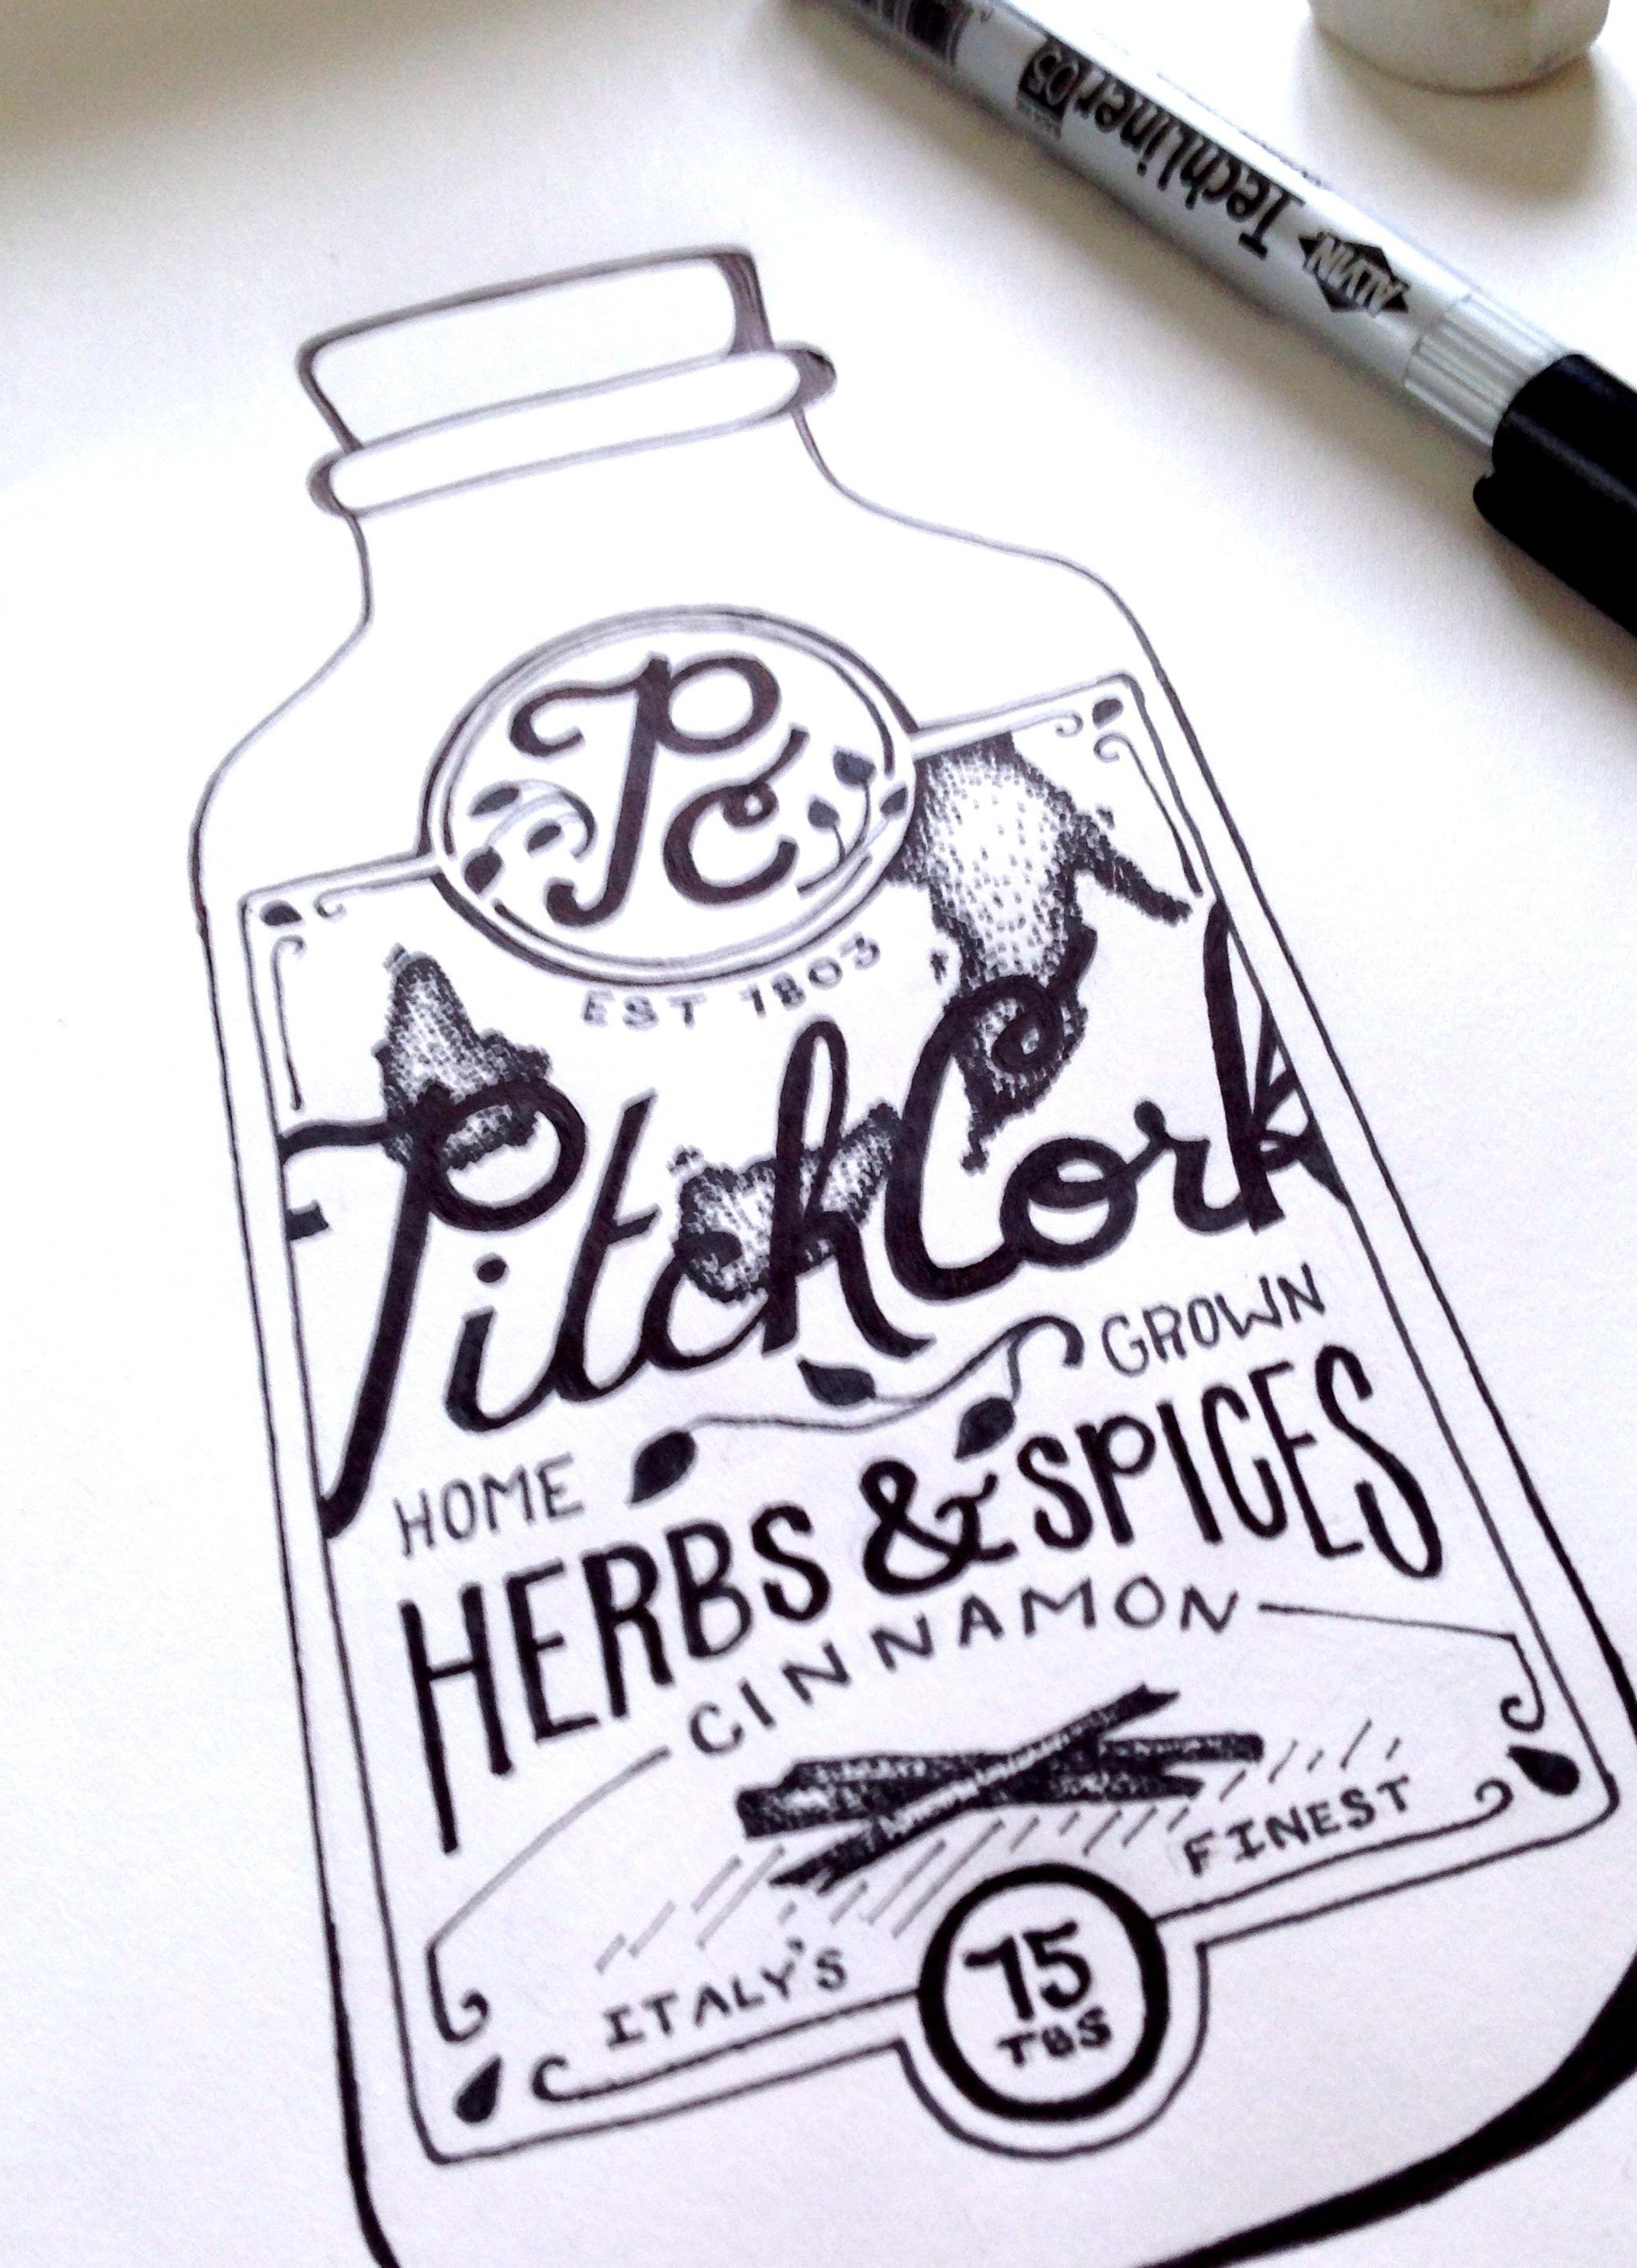 PitchCork Bottled Herbs - image 19 - student project